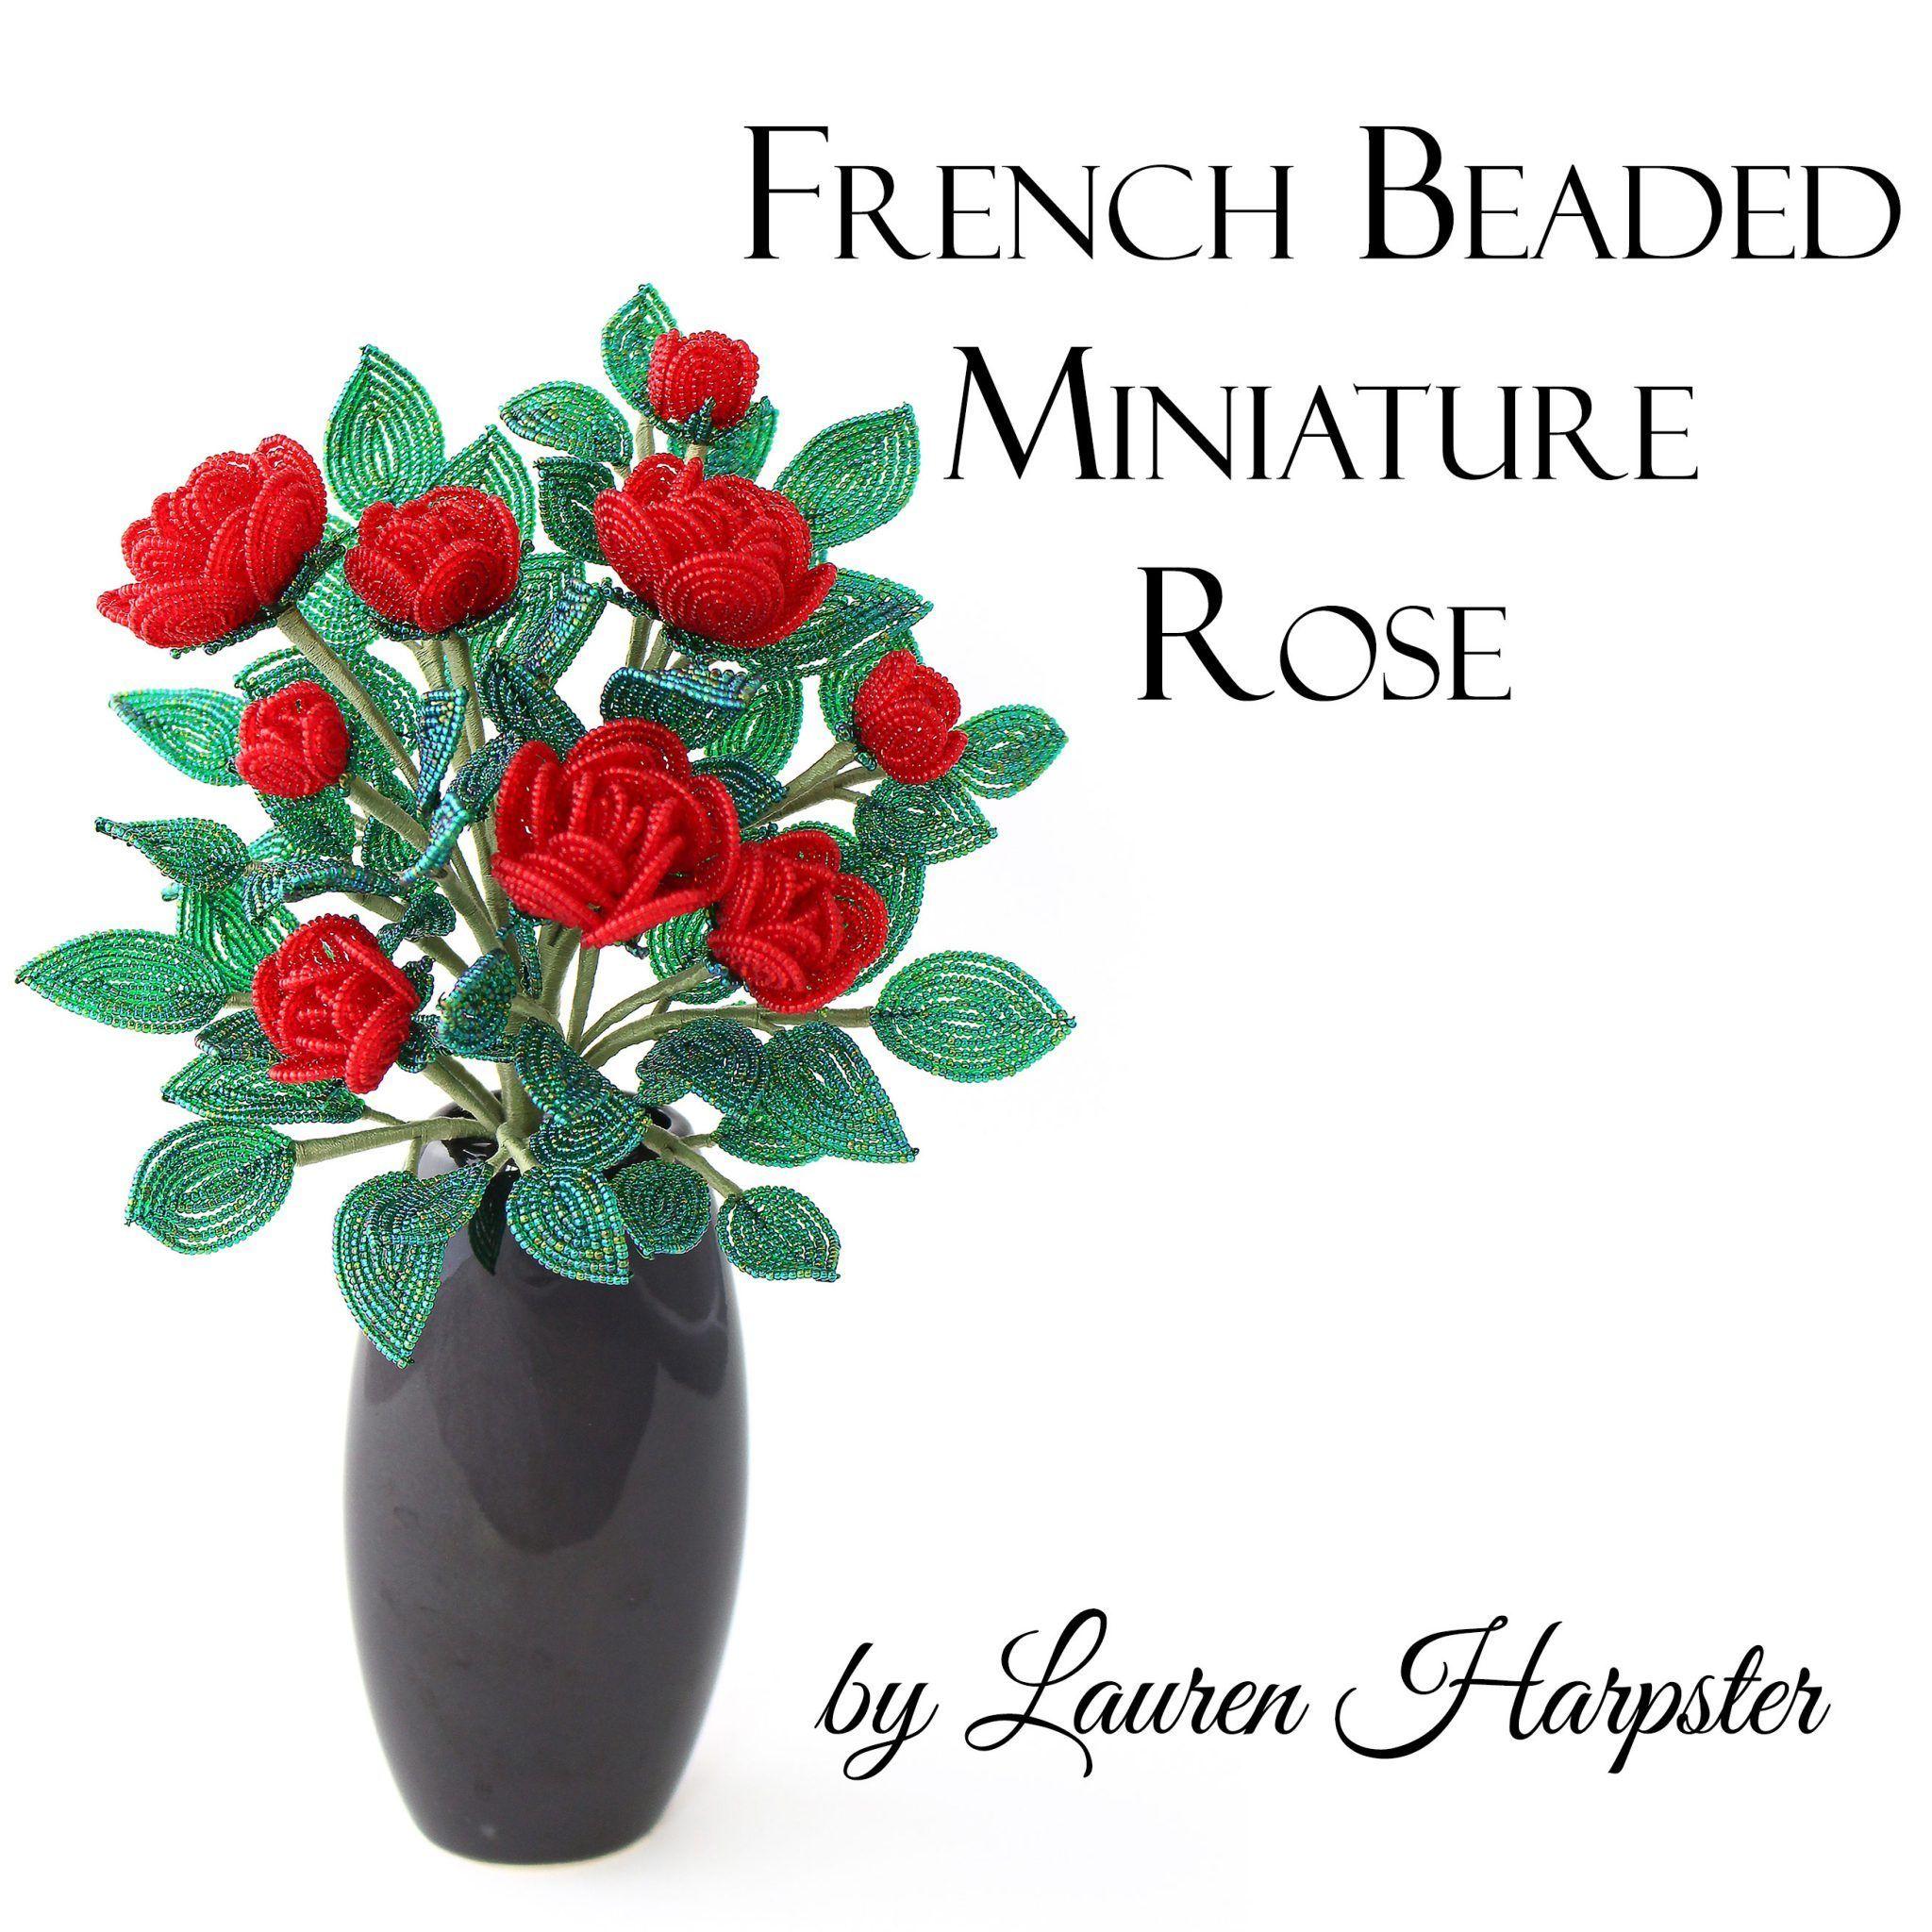 Pdf Pattern French Beaded Miniature Rose Beaded Flowers Patterns French Beaded Flowers Beaded Jewelry Patterns